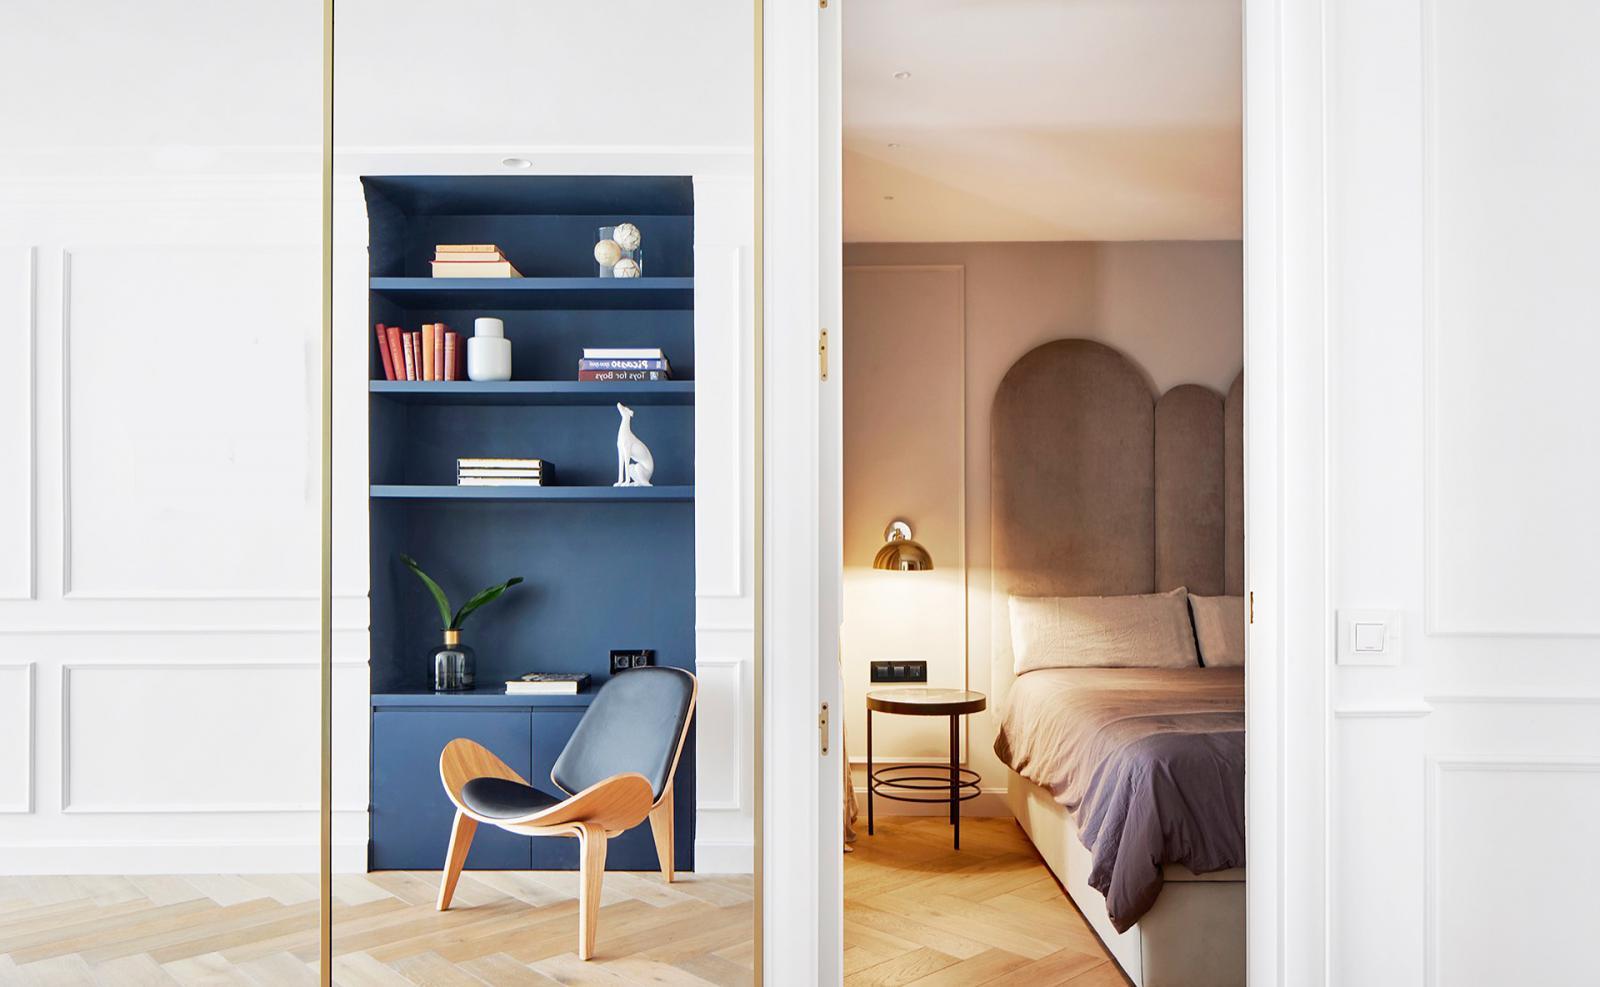 Квартира в Барселоне по проекту Мириам Баррио